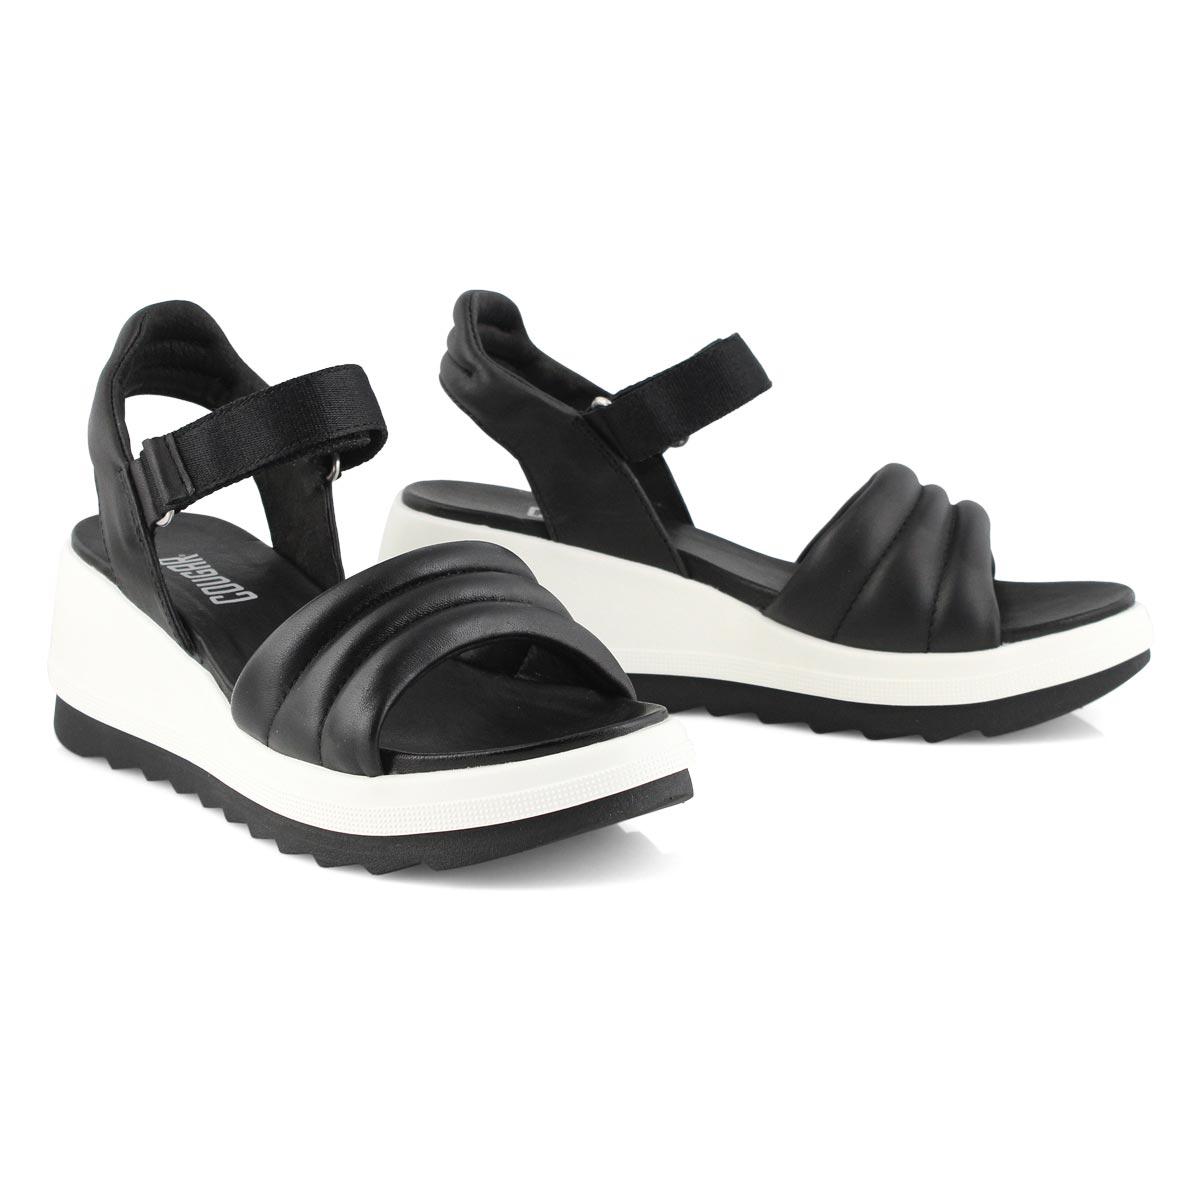 Women's HONEY black wedge sandals